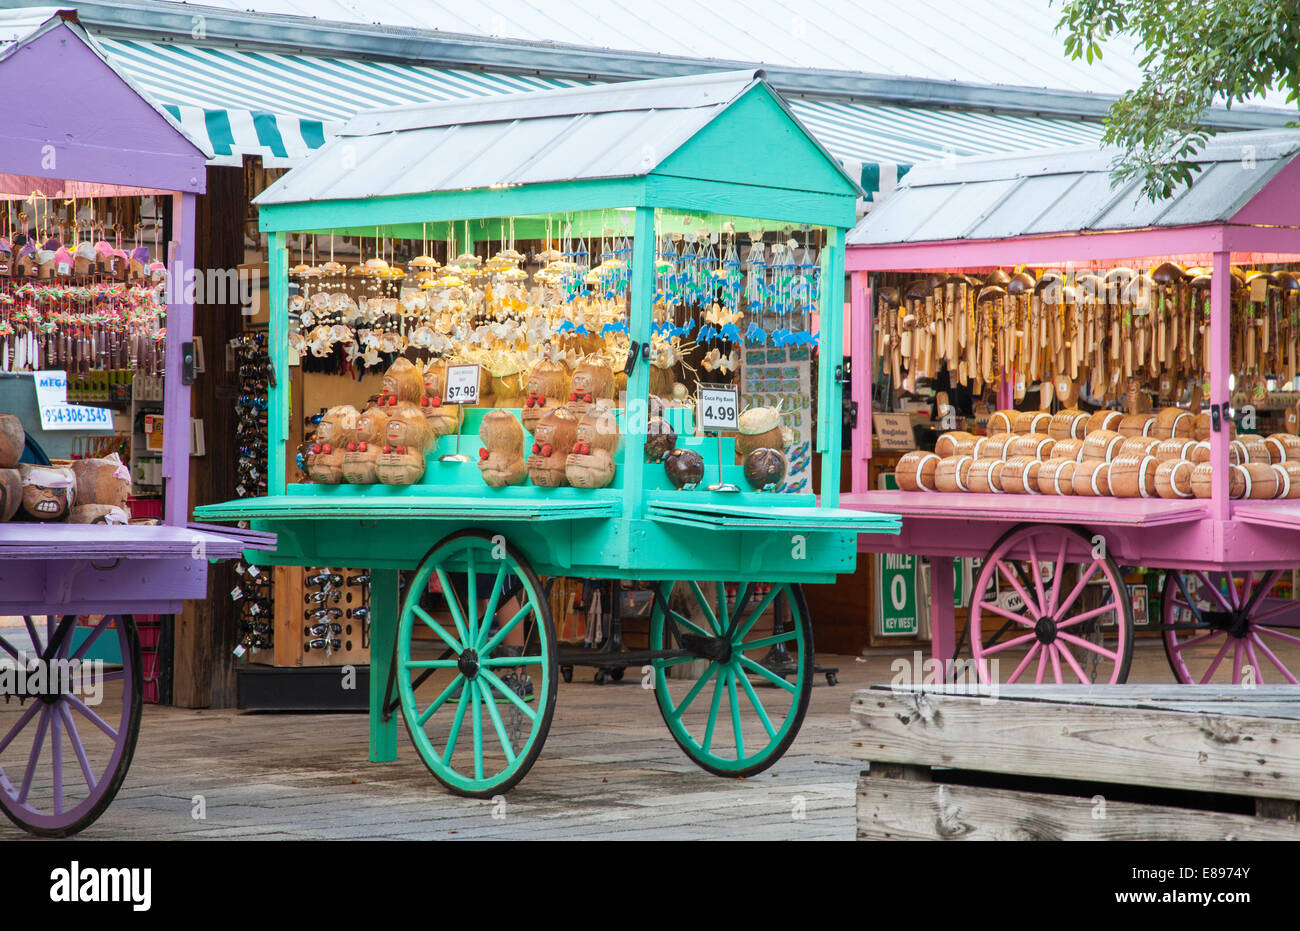 Souvenir carts in Mallory Square Key West Florida Keys - Stock Image